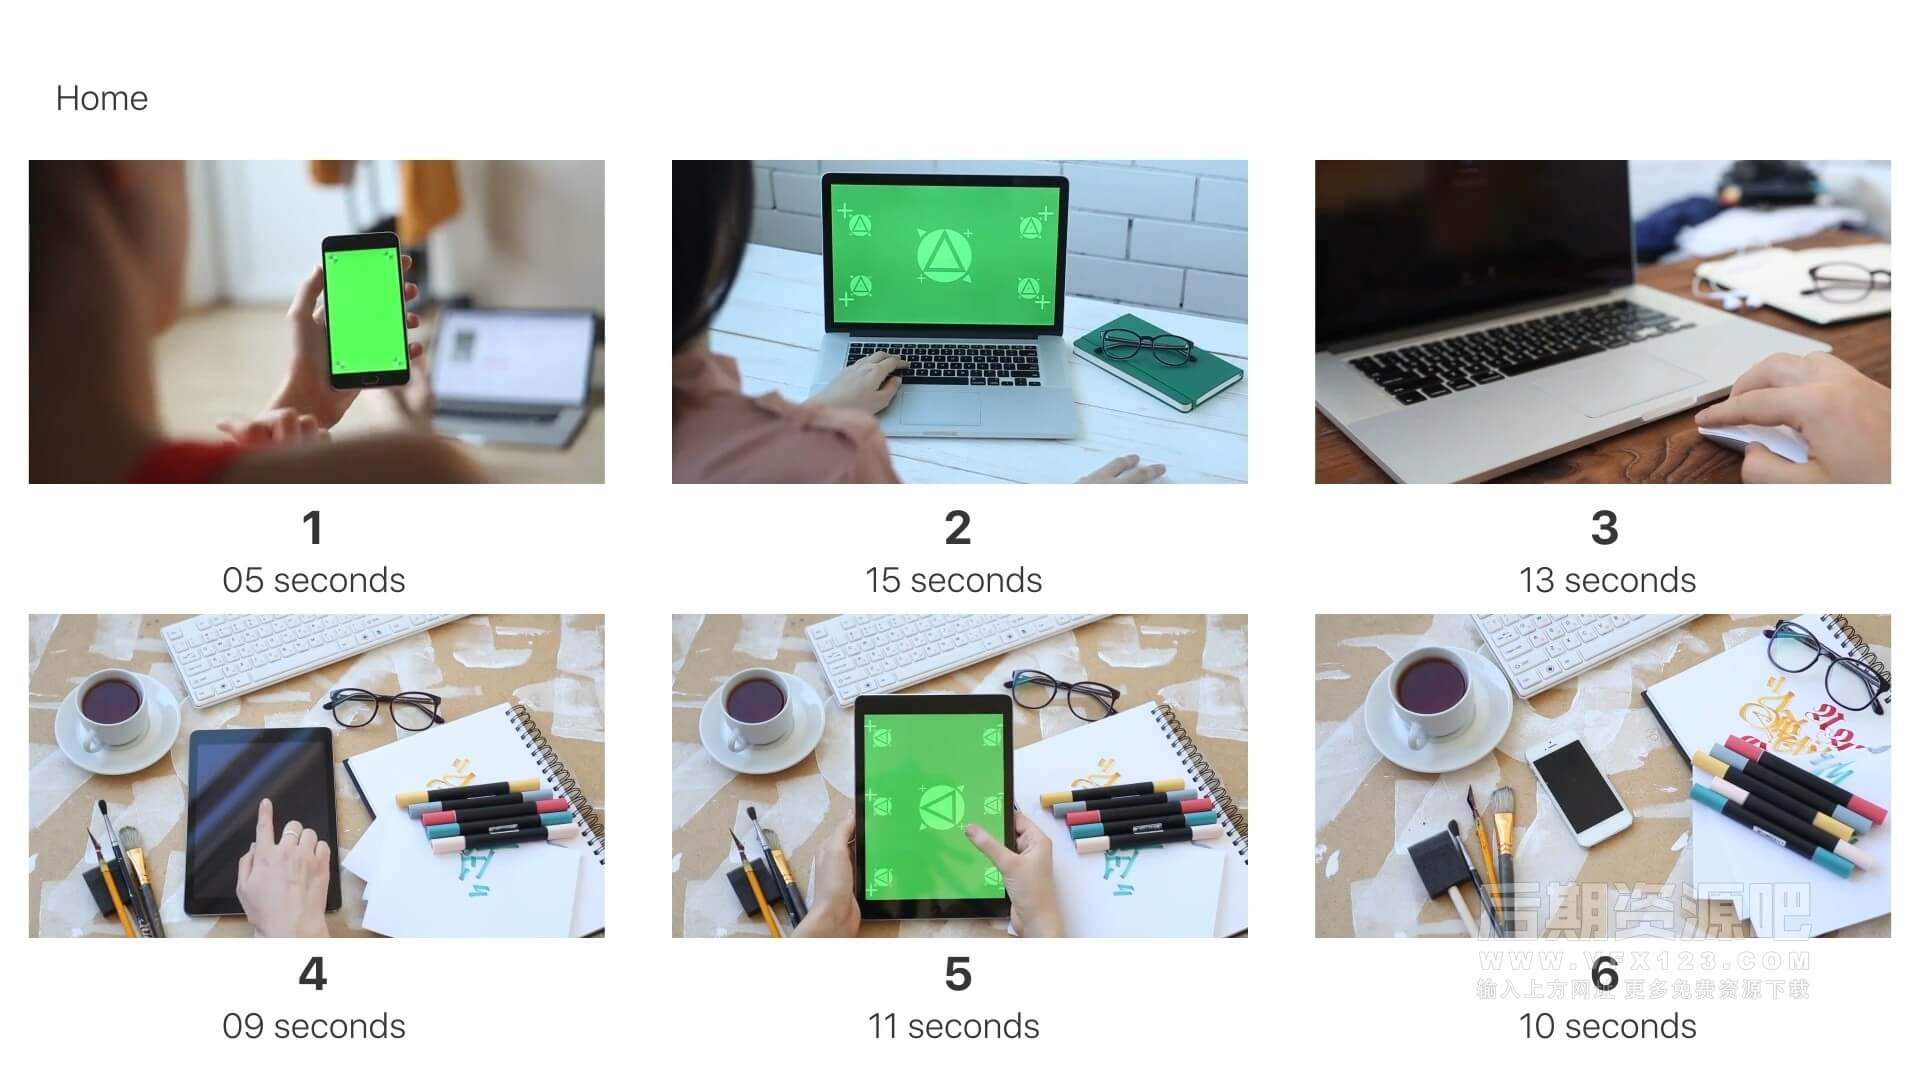 AE模板 120+多场景视频样机 简单快速 MockUp Kit v3.0